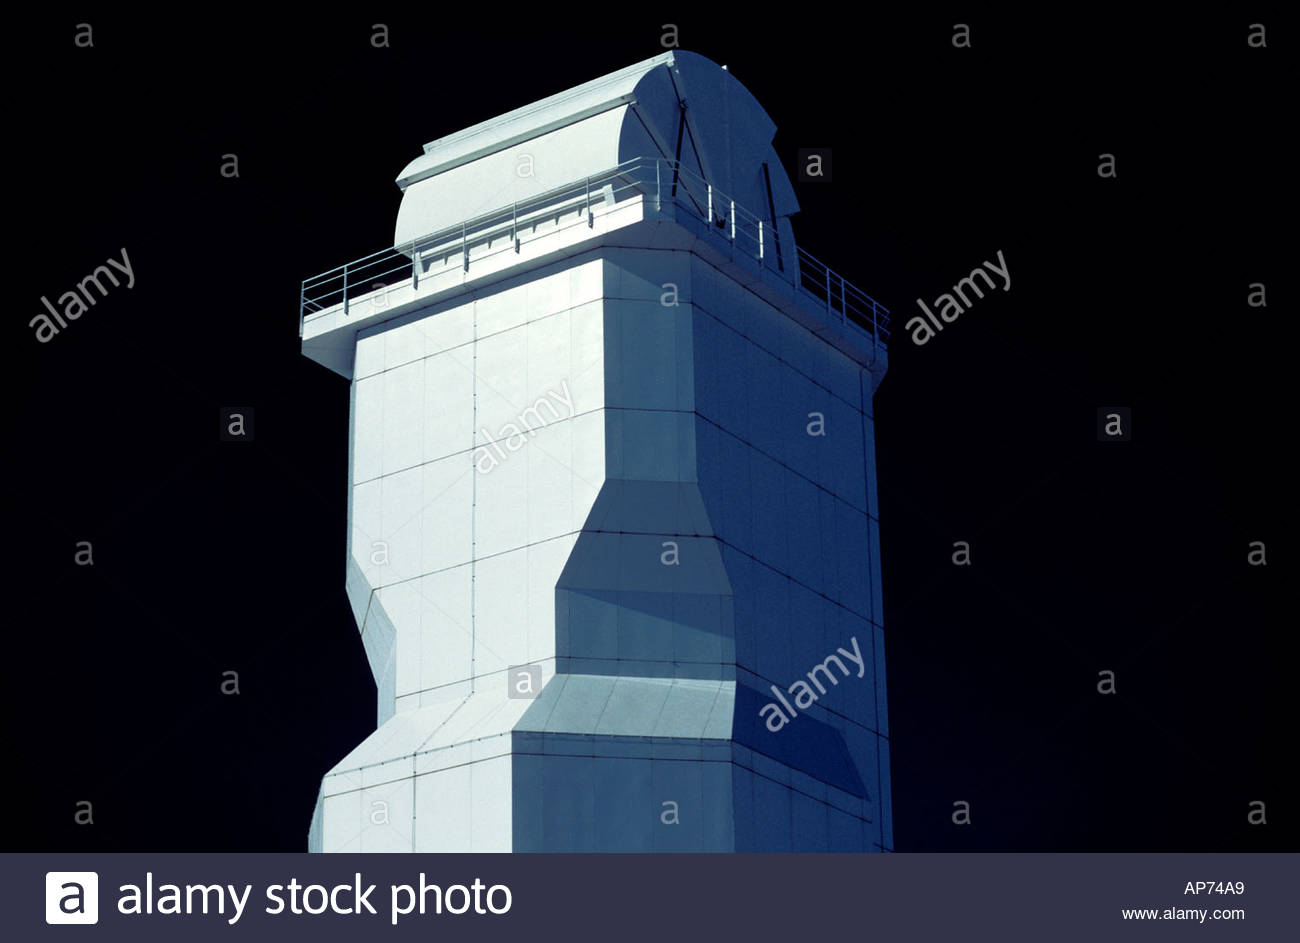 Observatorium teleskop astronomie optik spiegel objektiv